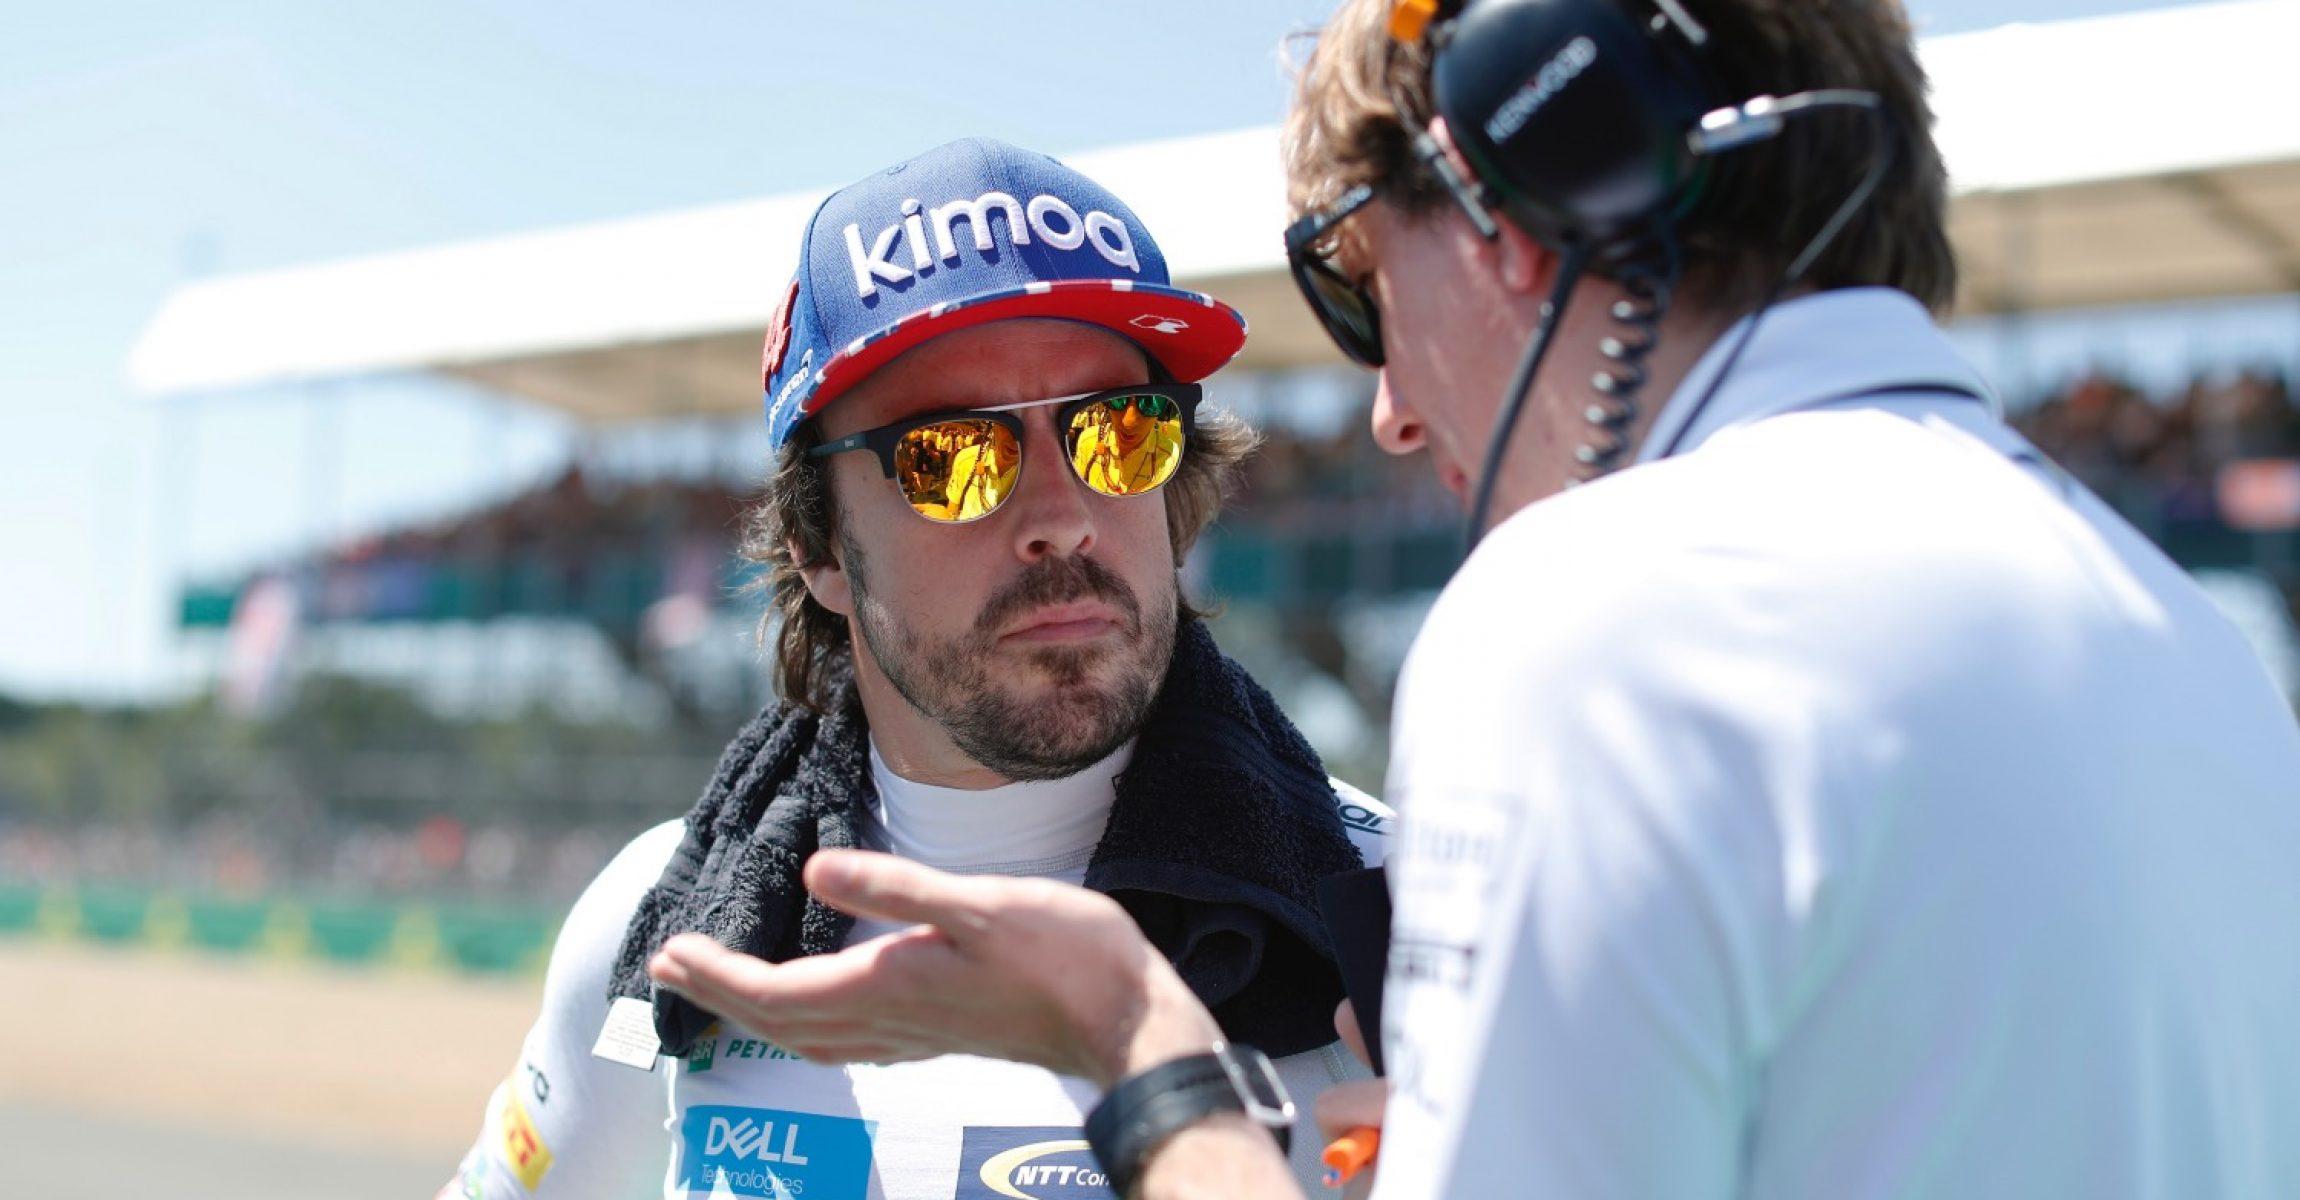 Silverstone Circuit, Northamptonshire, UK Sunday 8 July 2018. Fernando Alonso, McLaren, on the grid. Photo: Steven Tee/McLaren ref: Digital Image _1ST0656